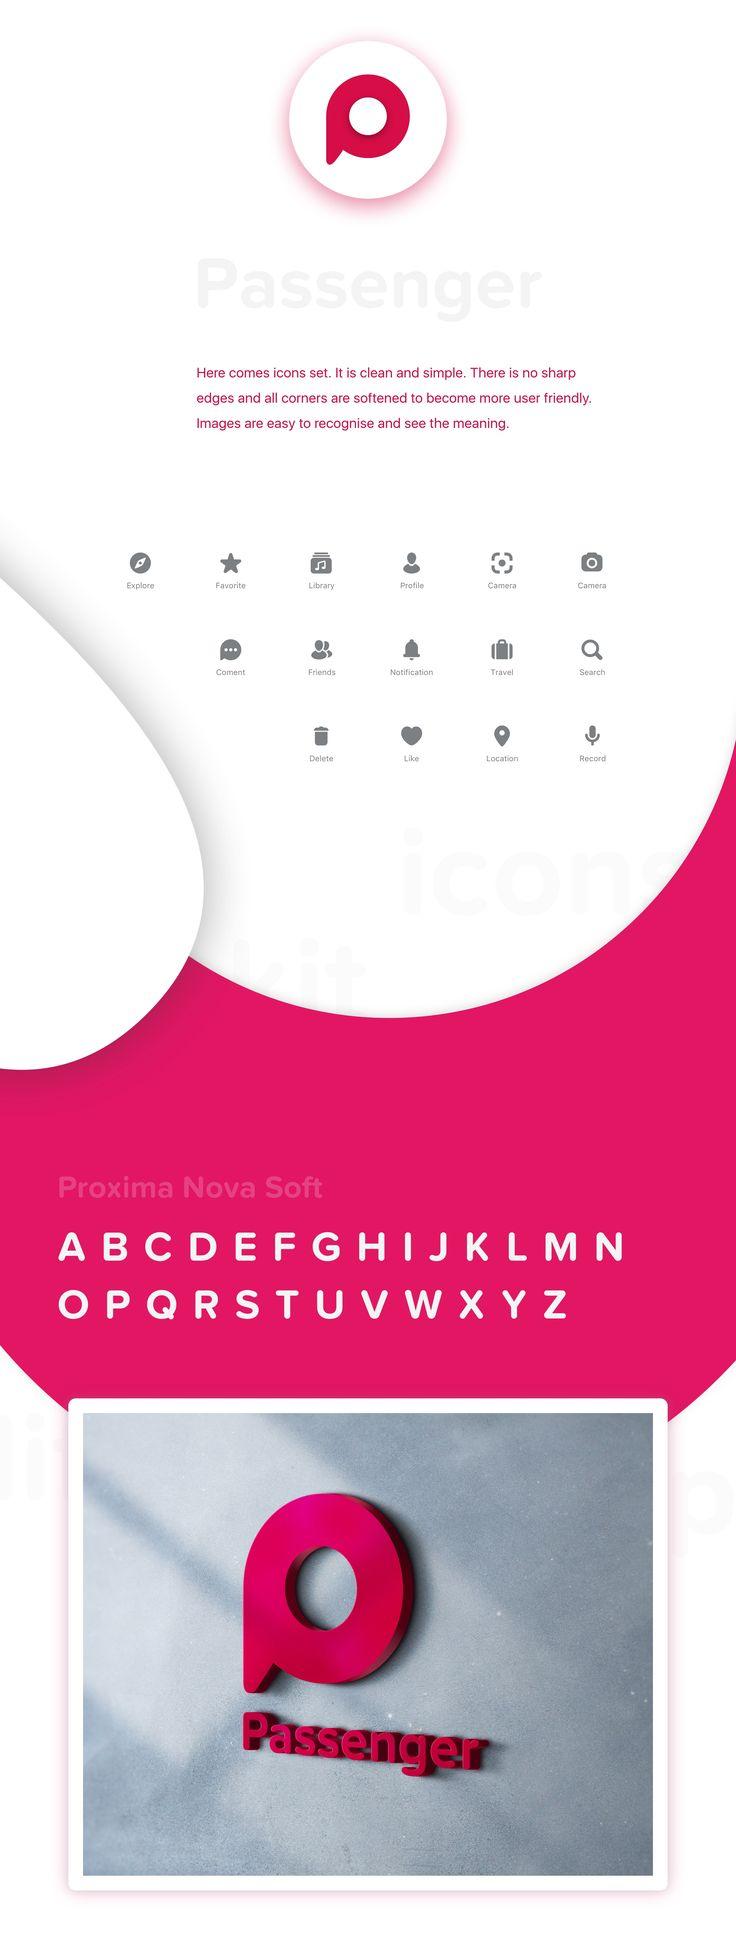 Art Direction – Edward B.Graphic designer – Daria P.WEB – Igor L.Mobile Designer, Animation, Icons - Edward B.